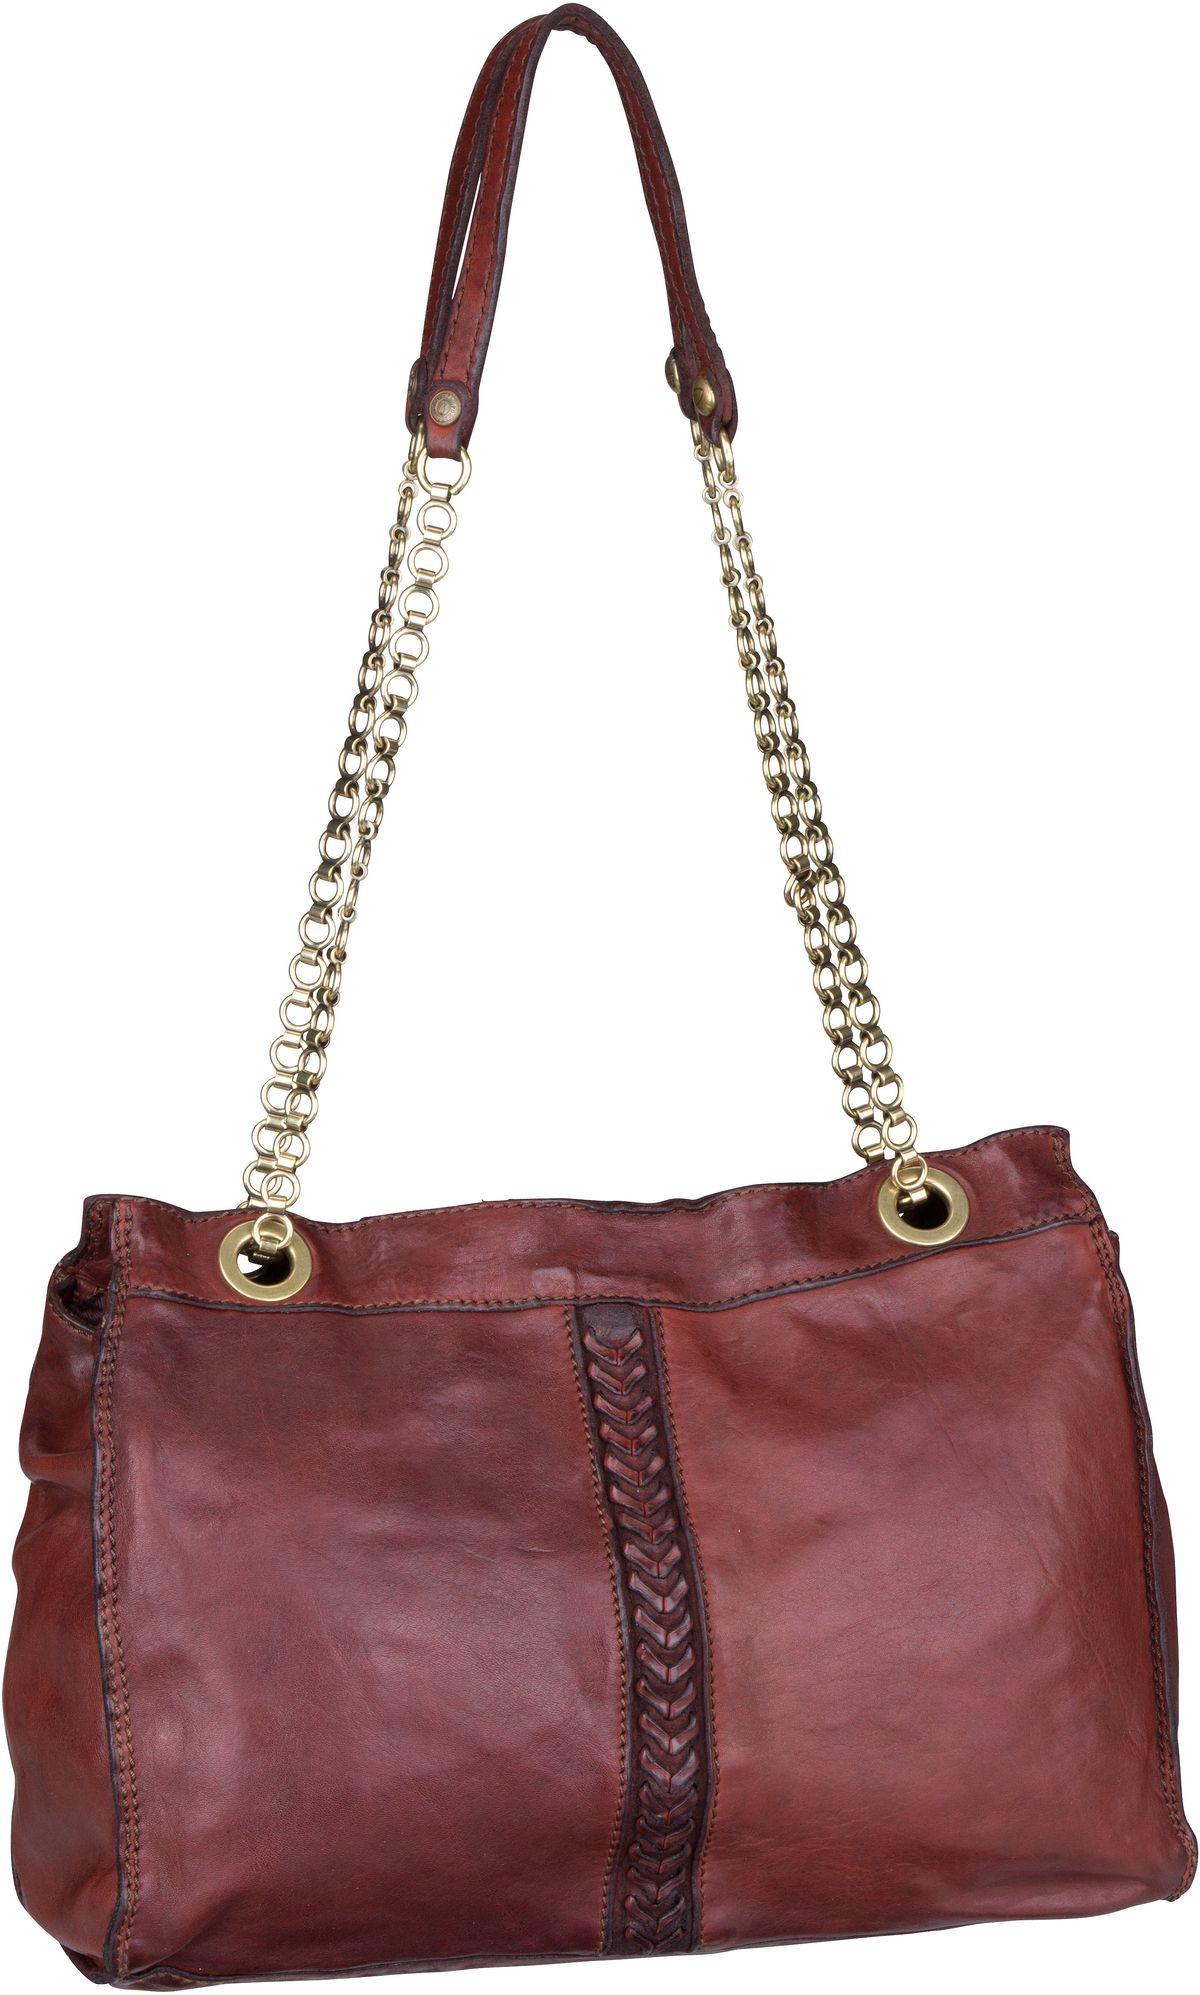 Handtasche Afrodite C16640 Vinaccia